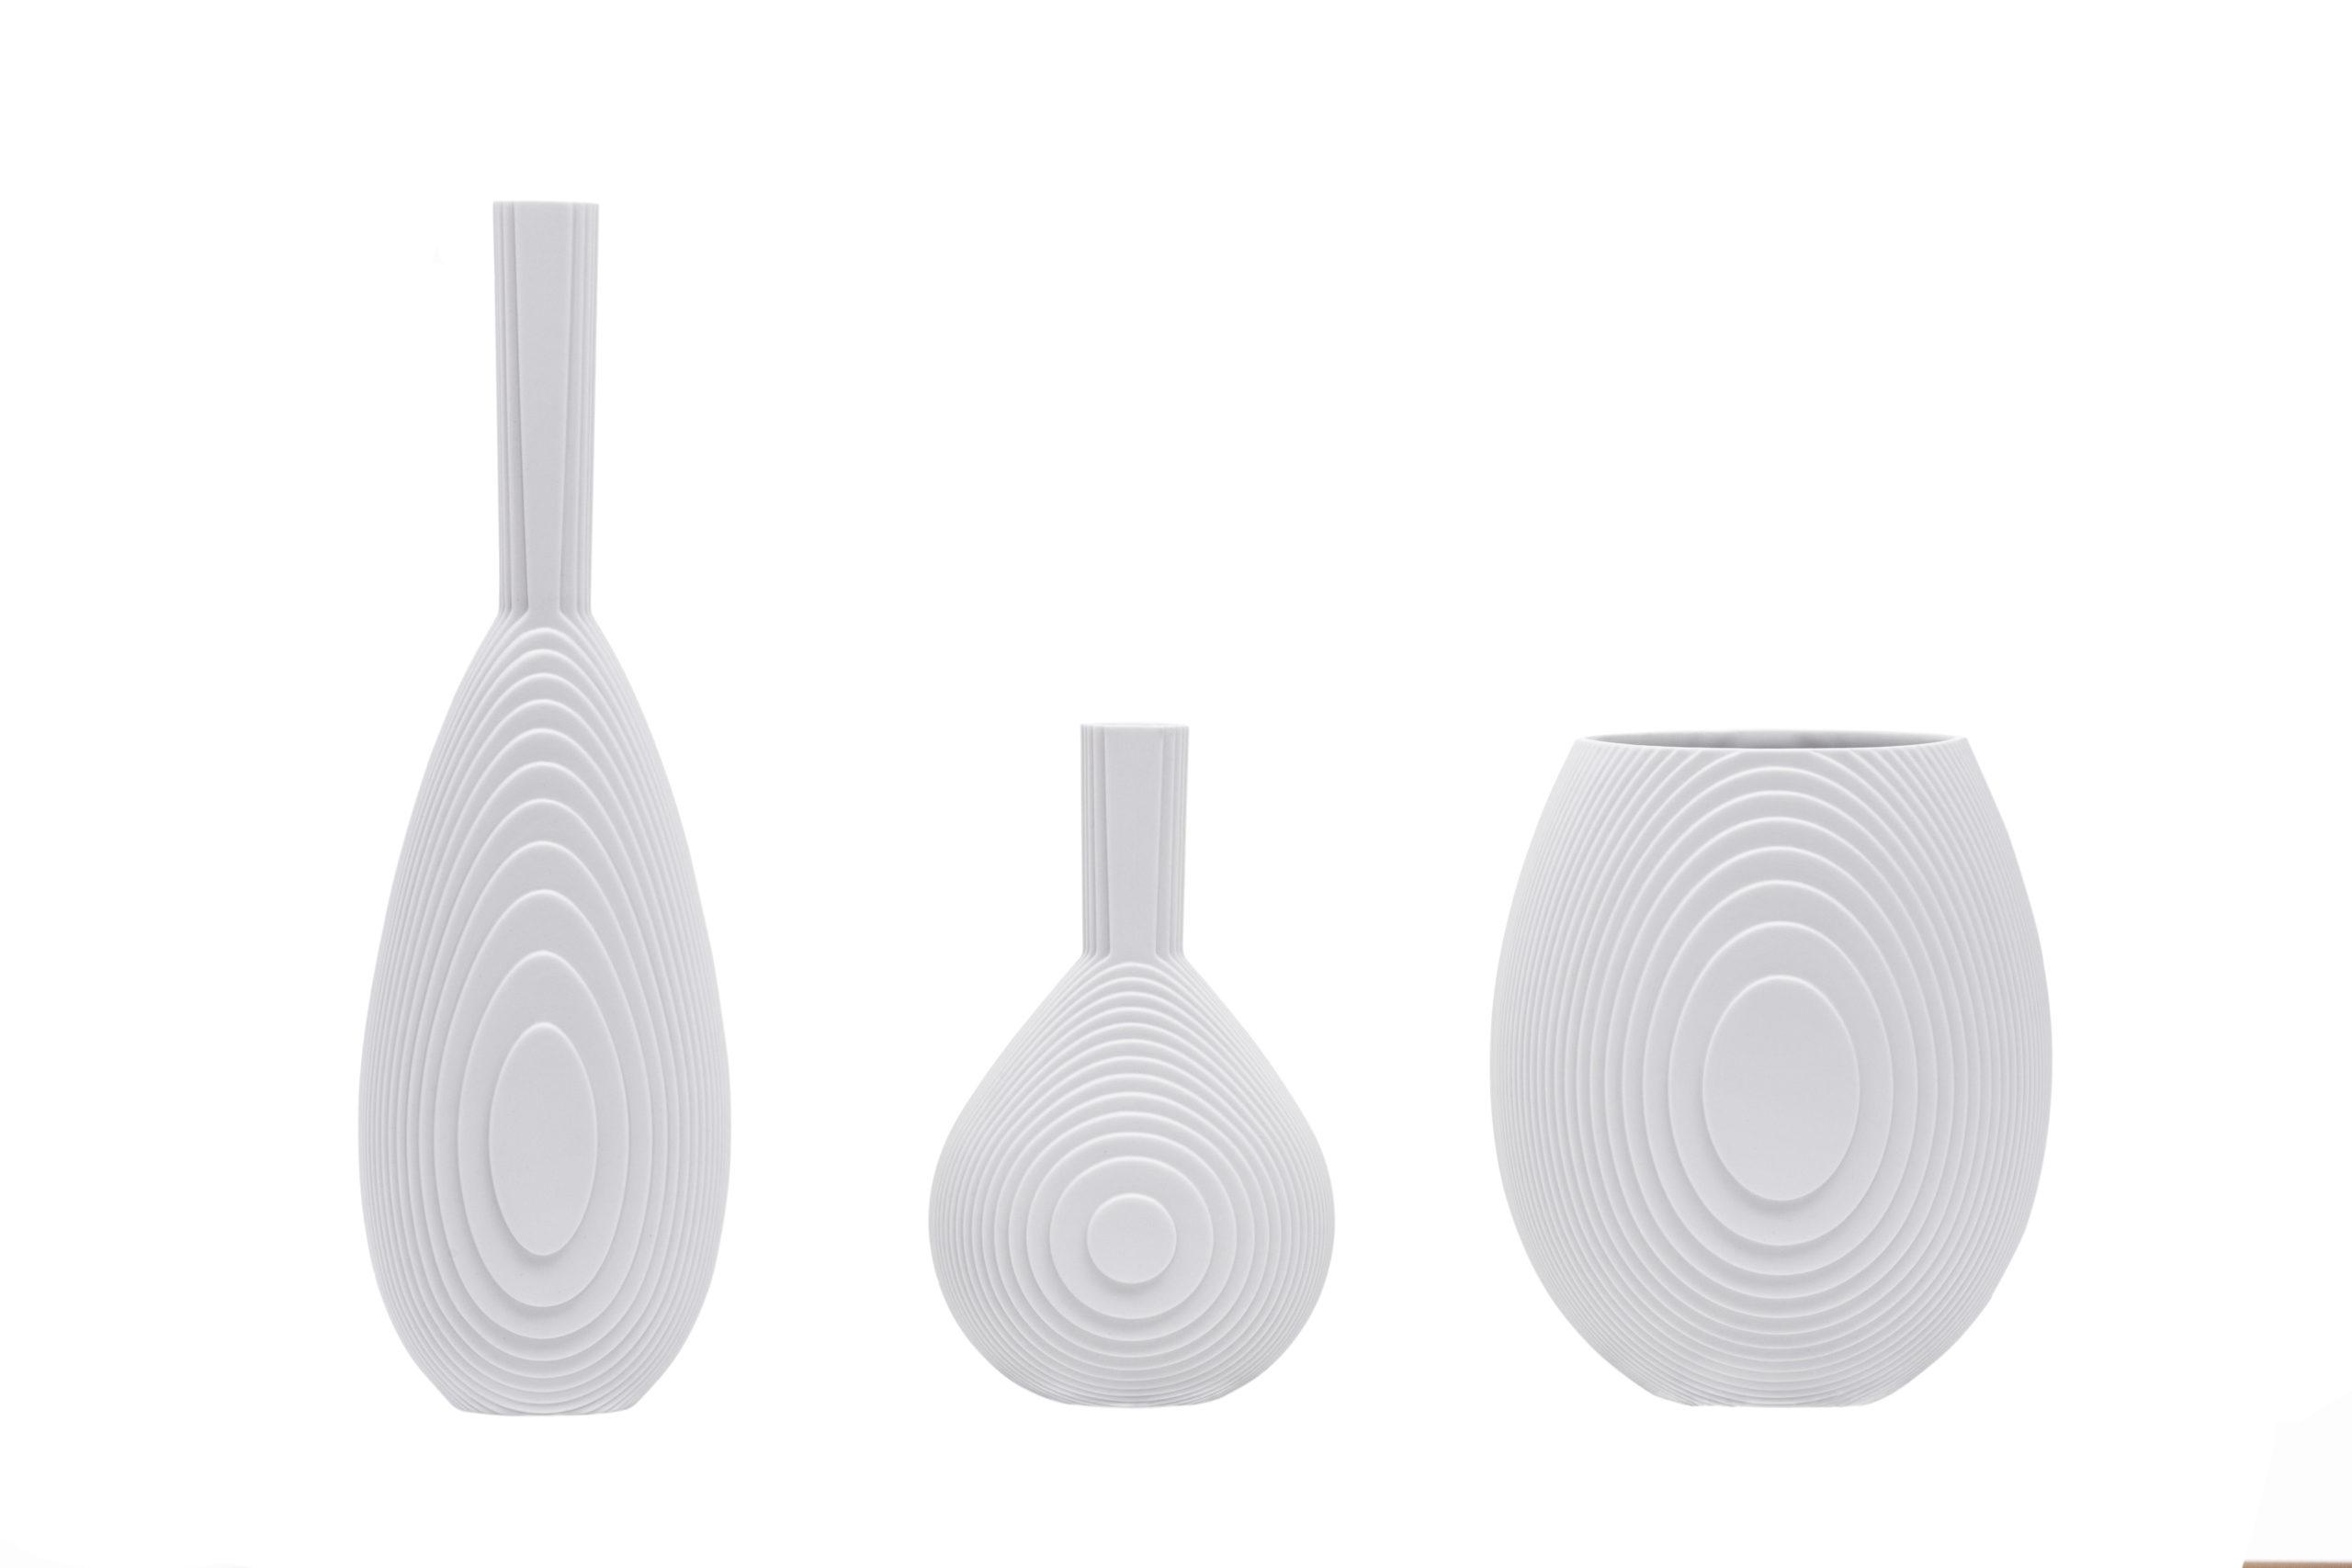 Architectmade-Flow-Porcelain-Vibeke-Rytter-1